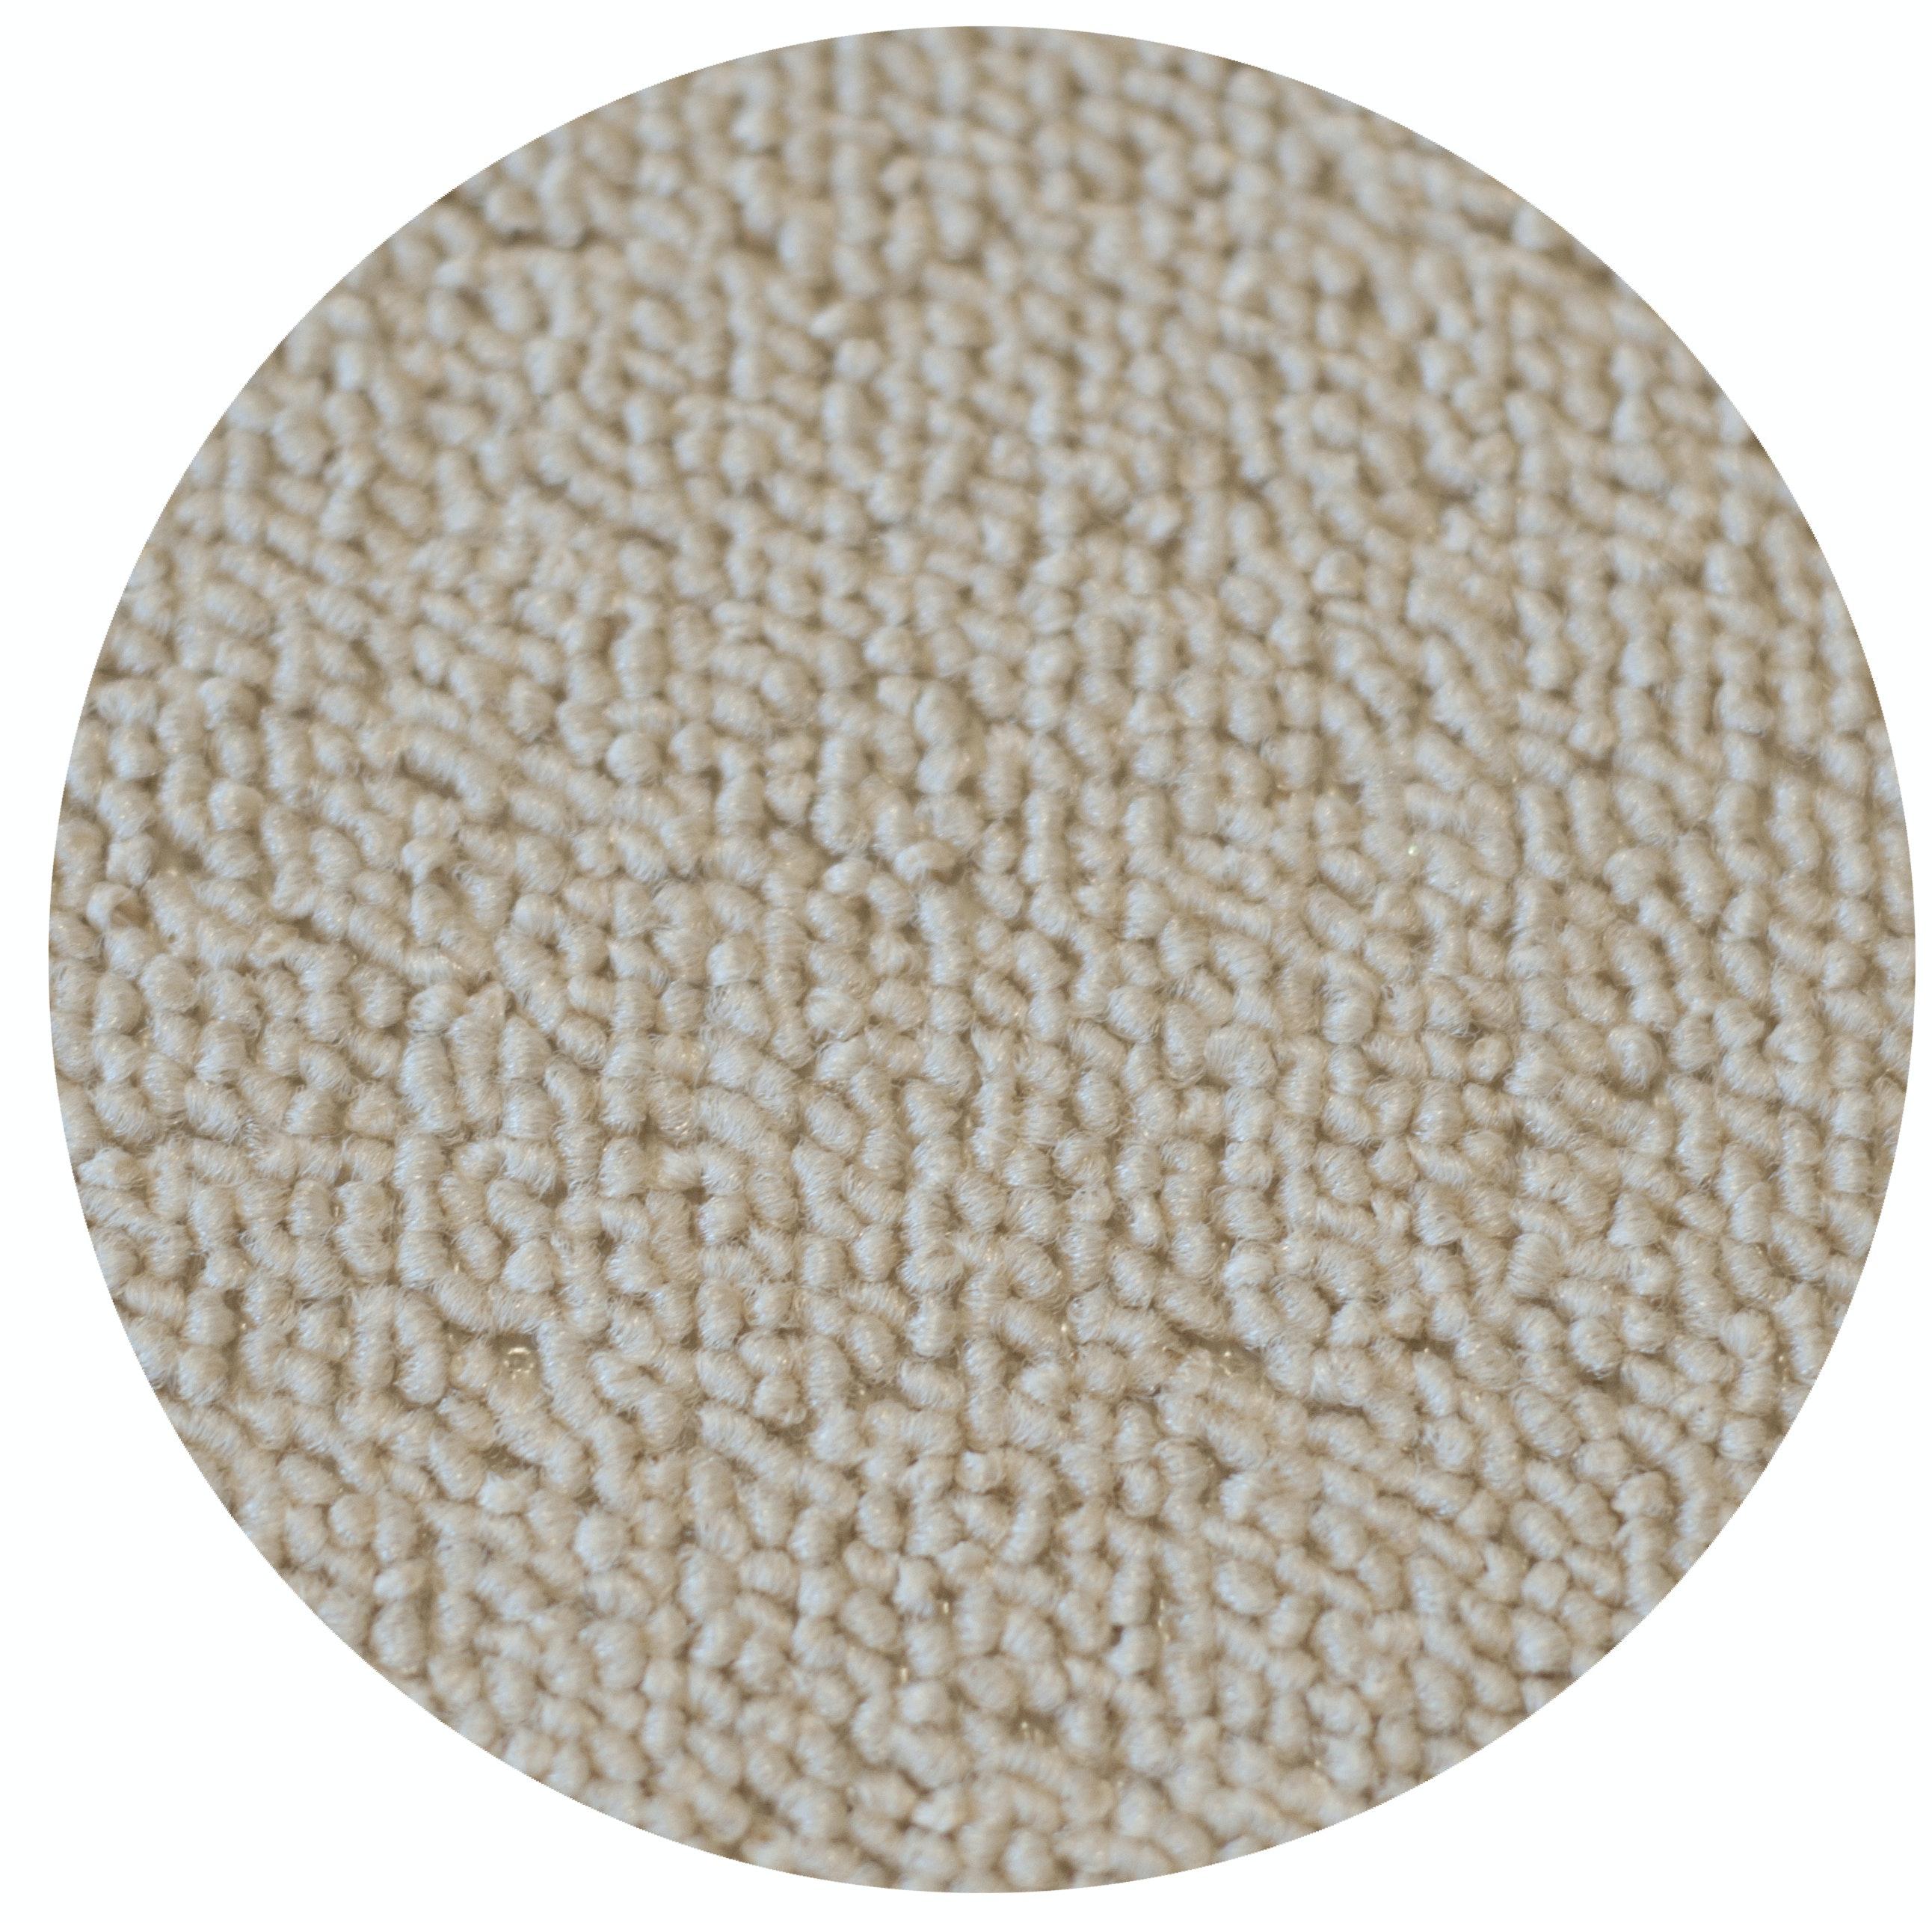 Textilgolv Heltäckningsmatta Fibertrone Basic 10m² Beige 66